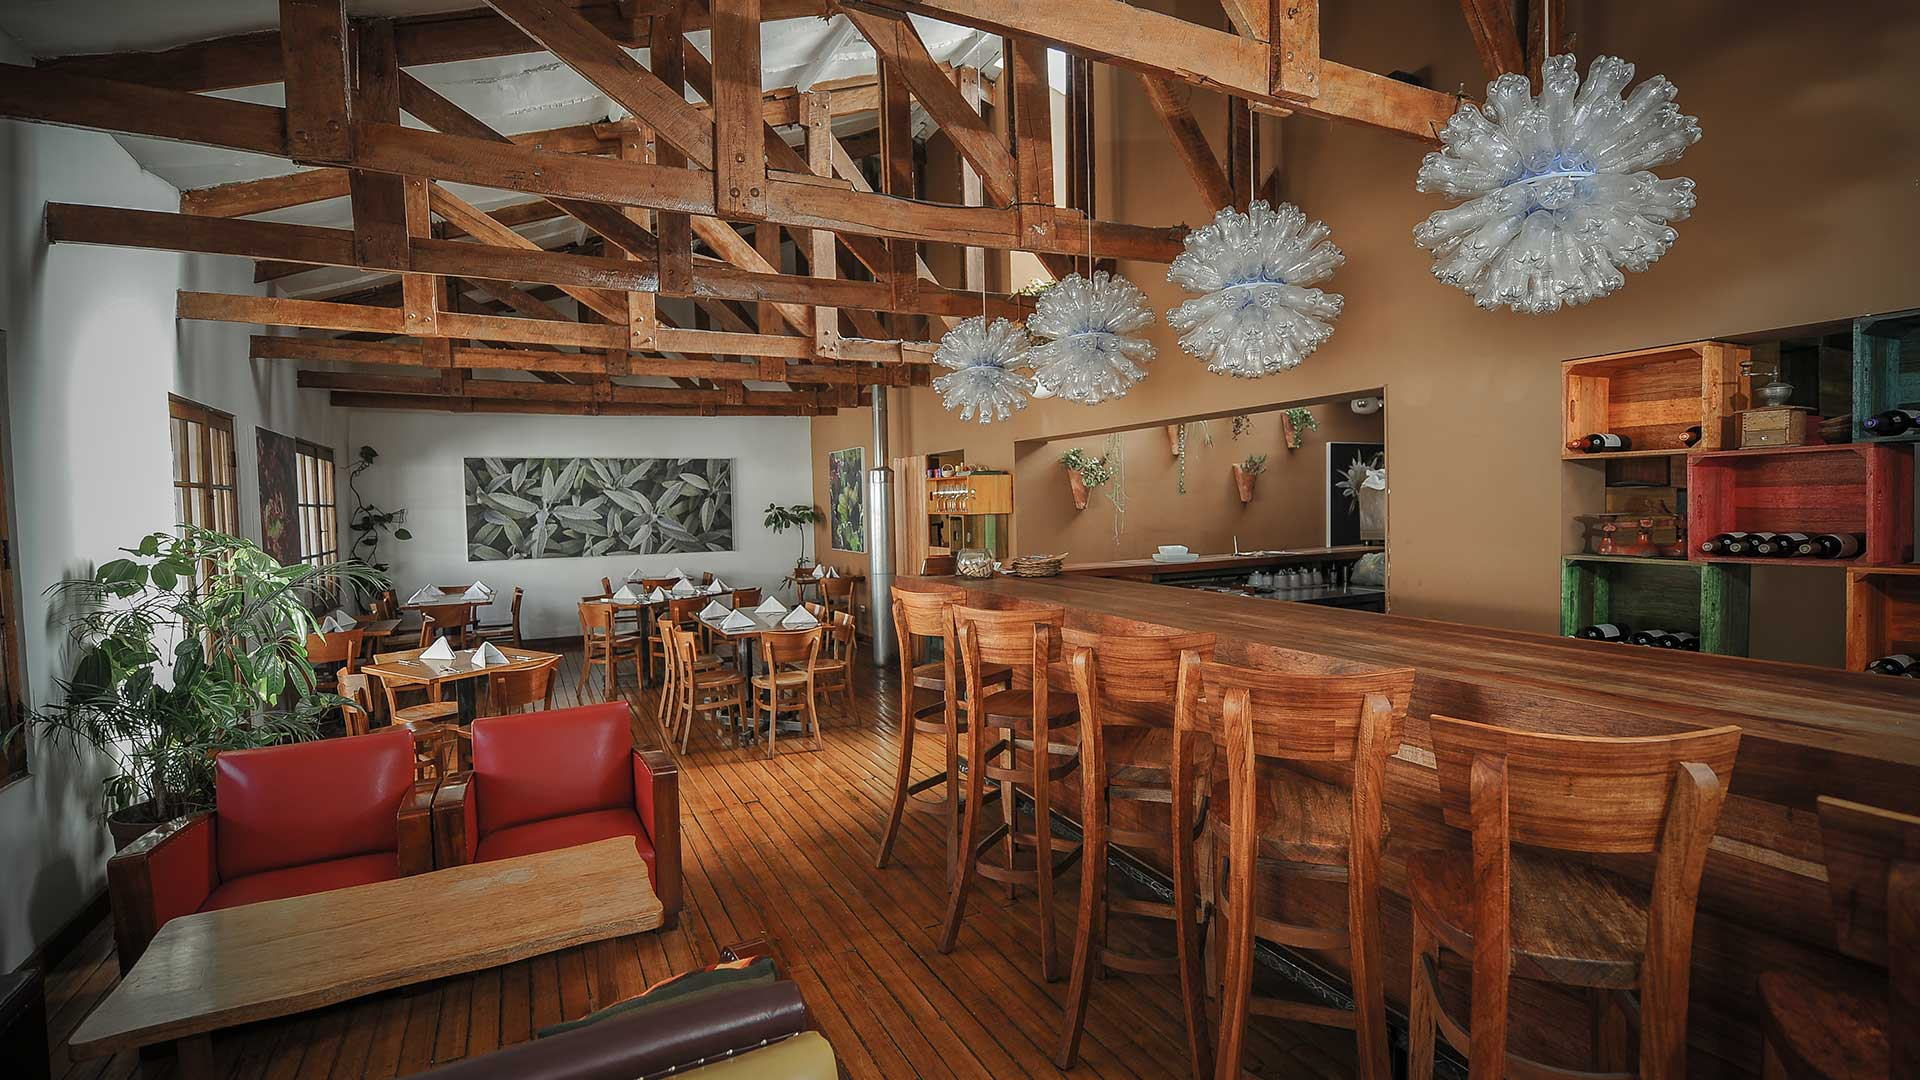 GREENS ORGANIC  Santa Catalina Angosta, 135 Cusco, Perú Telefono: +51 84 254753 www.cuscorestaurants.com ventas@cuscorestaurants.com